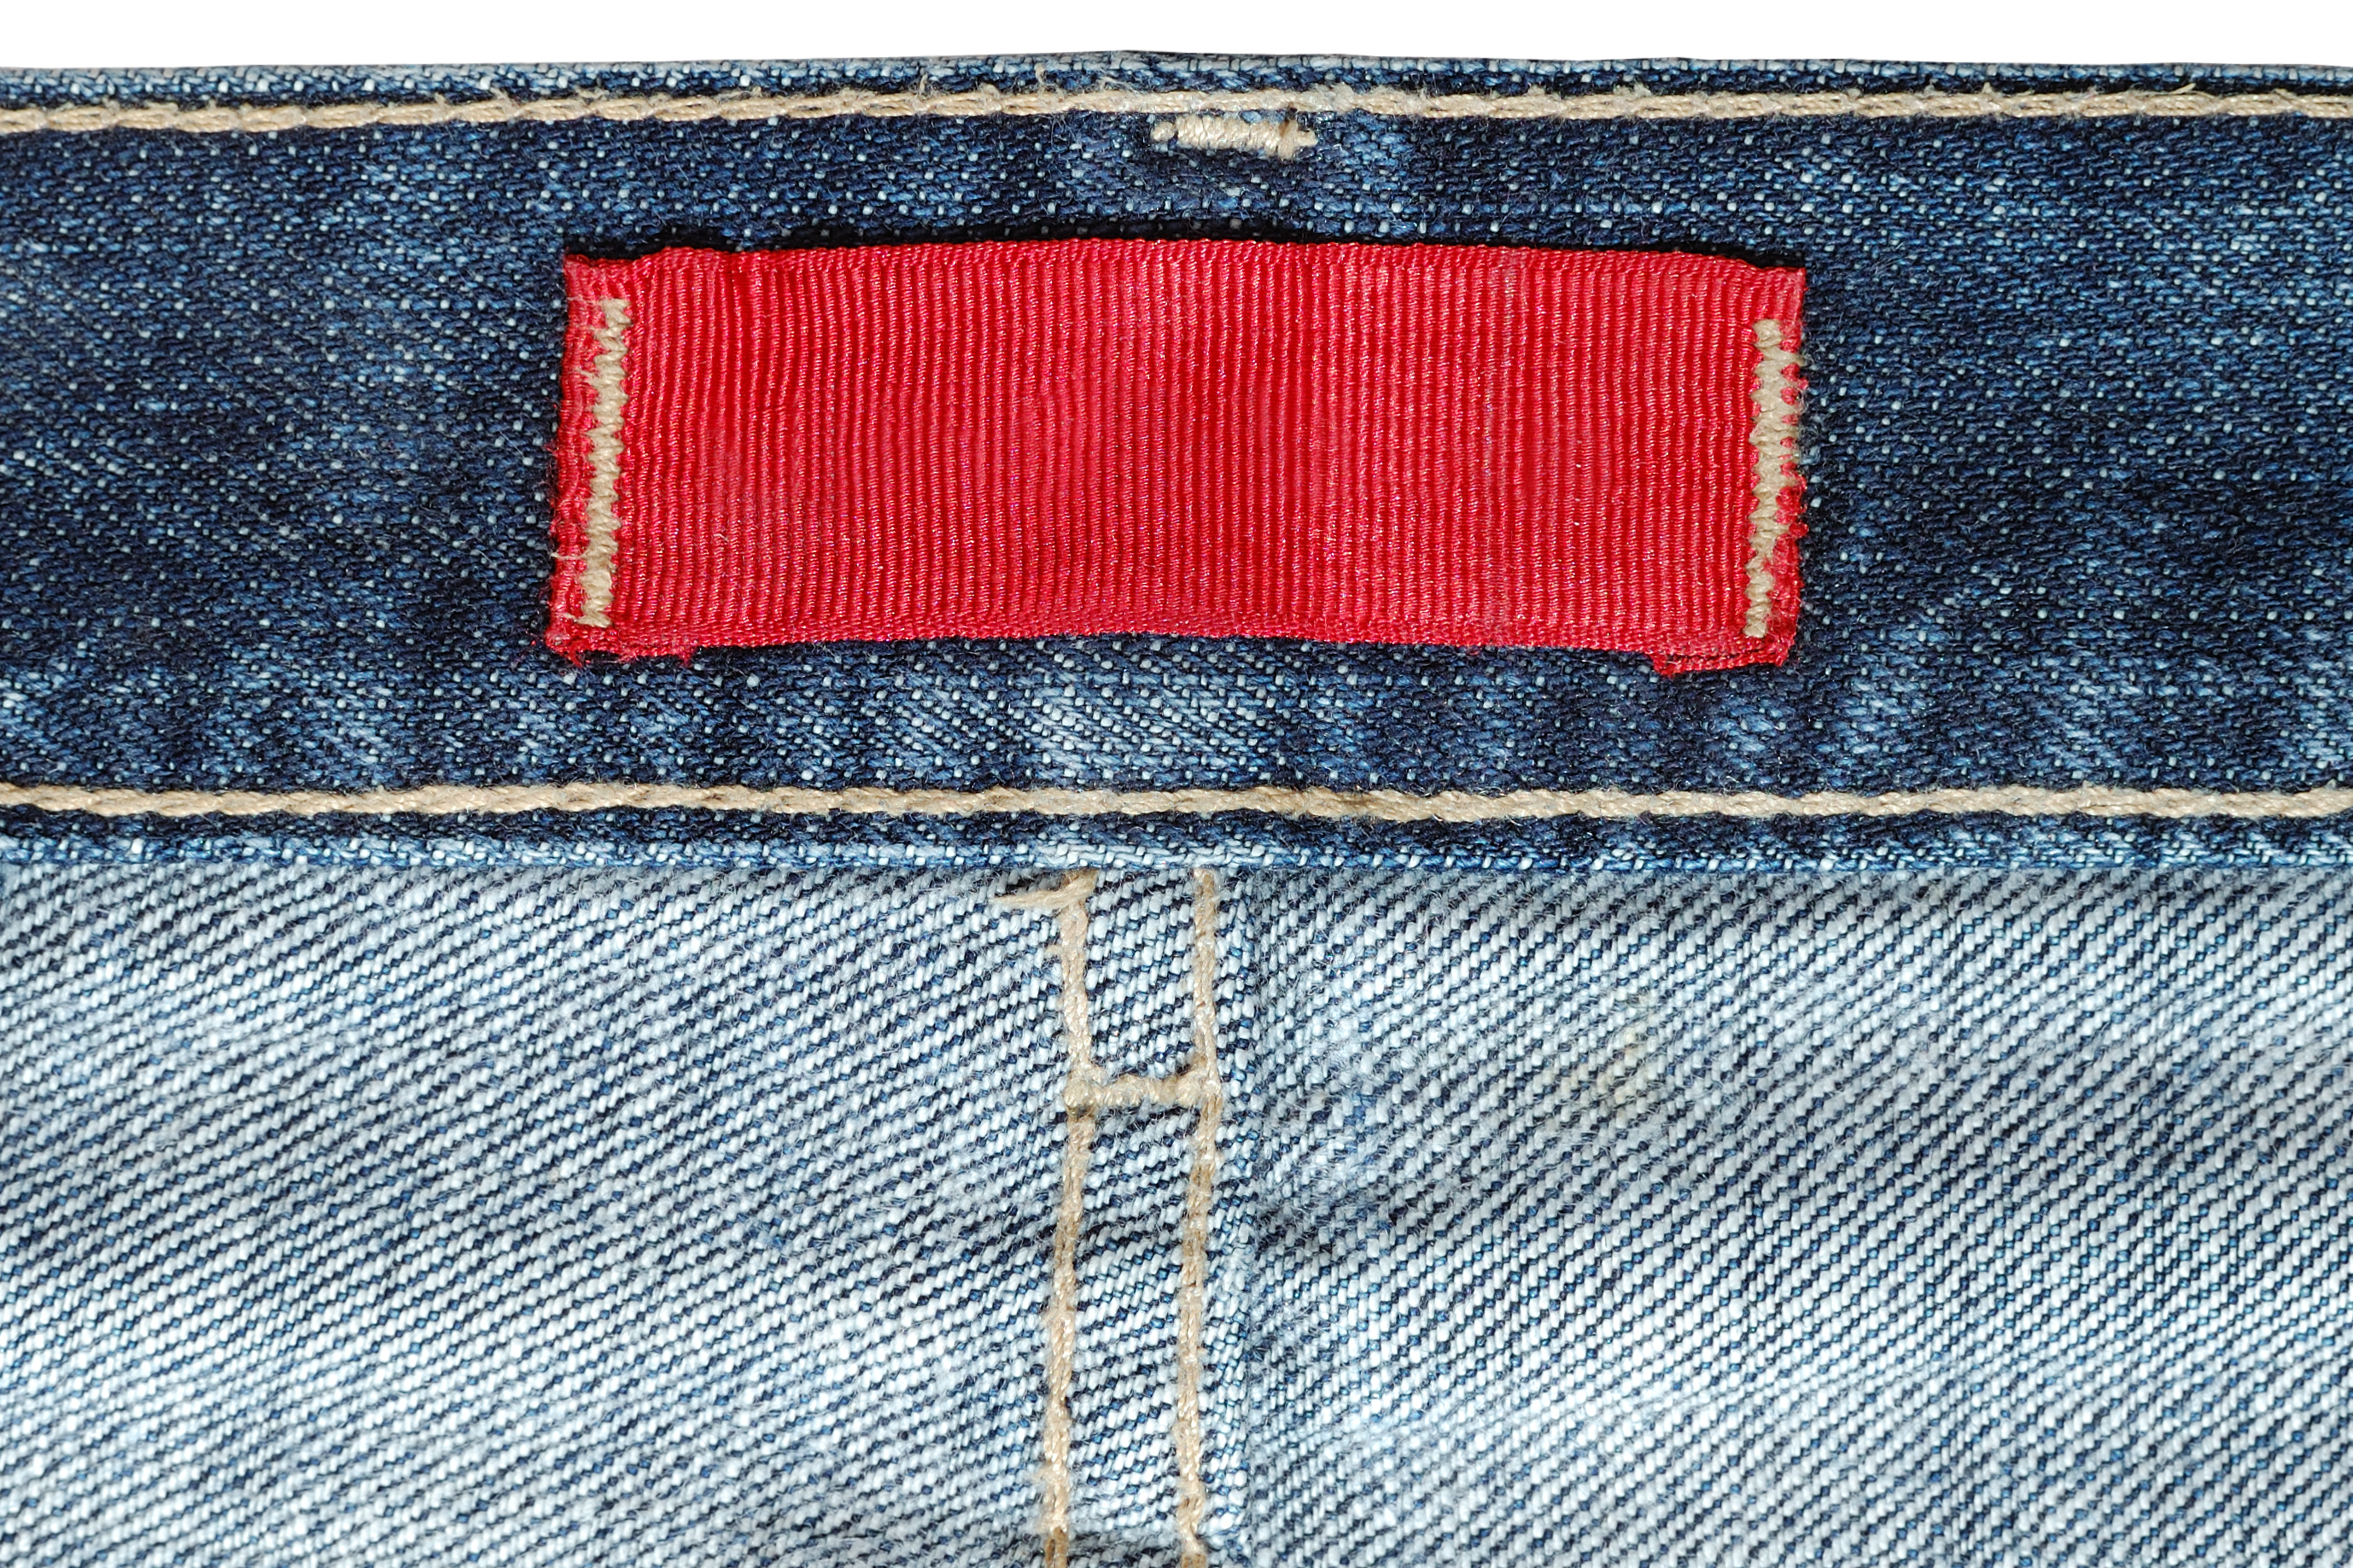 jeans care label